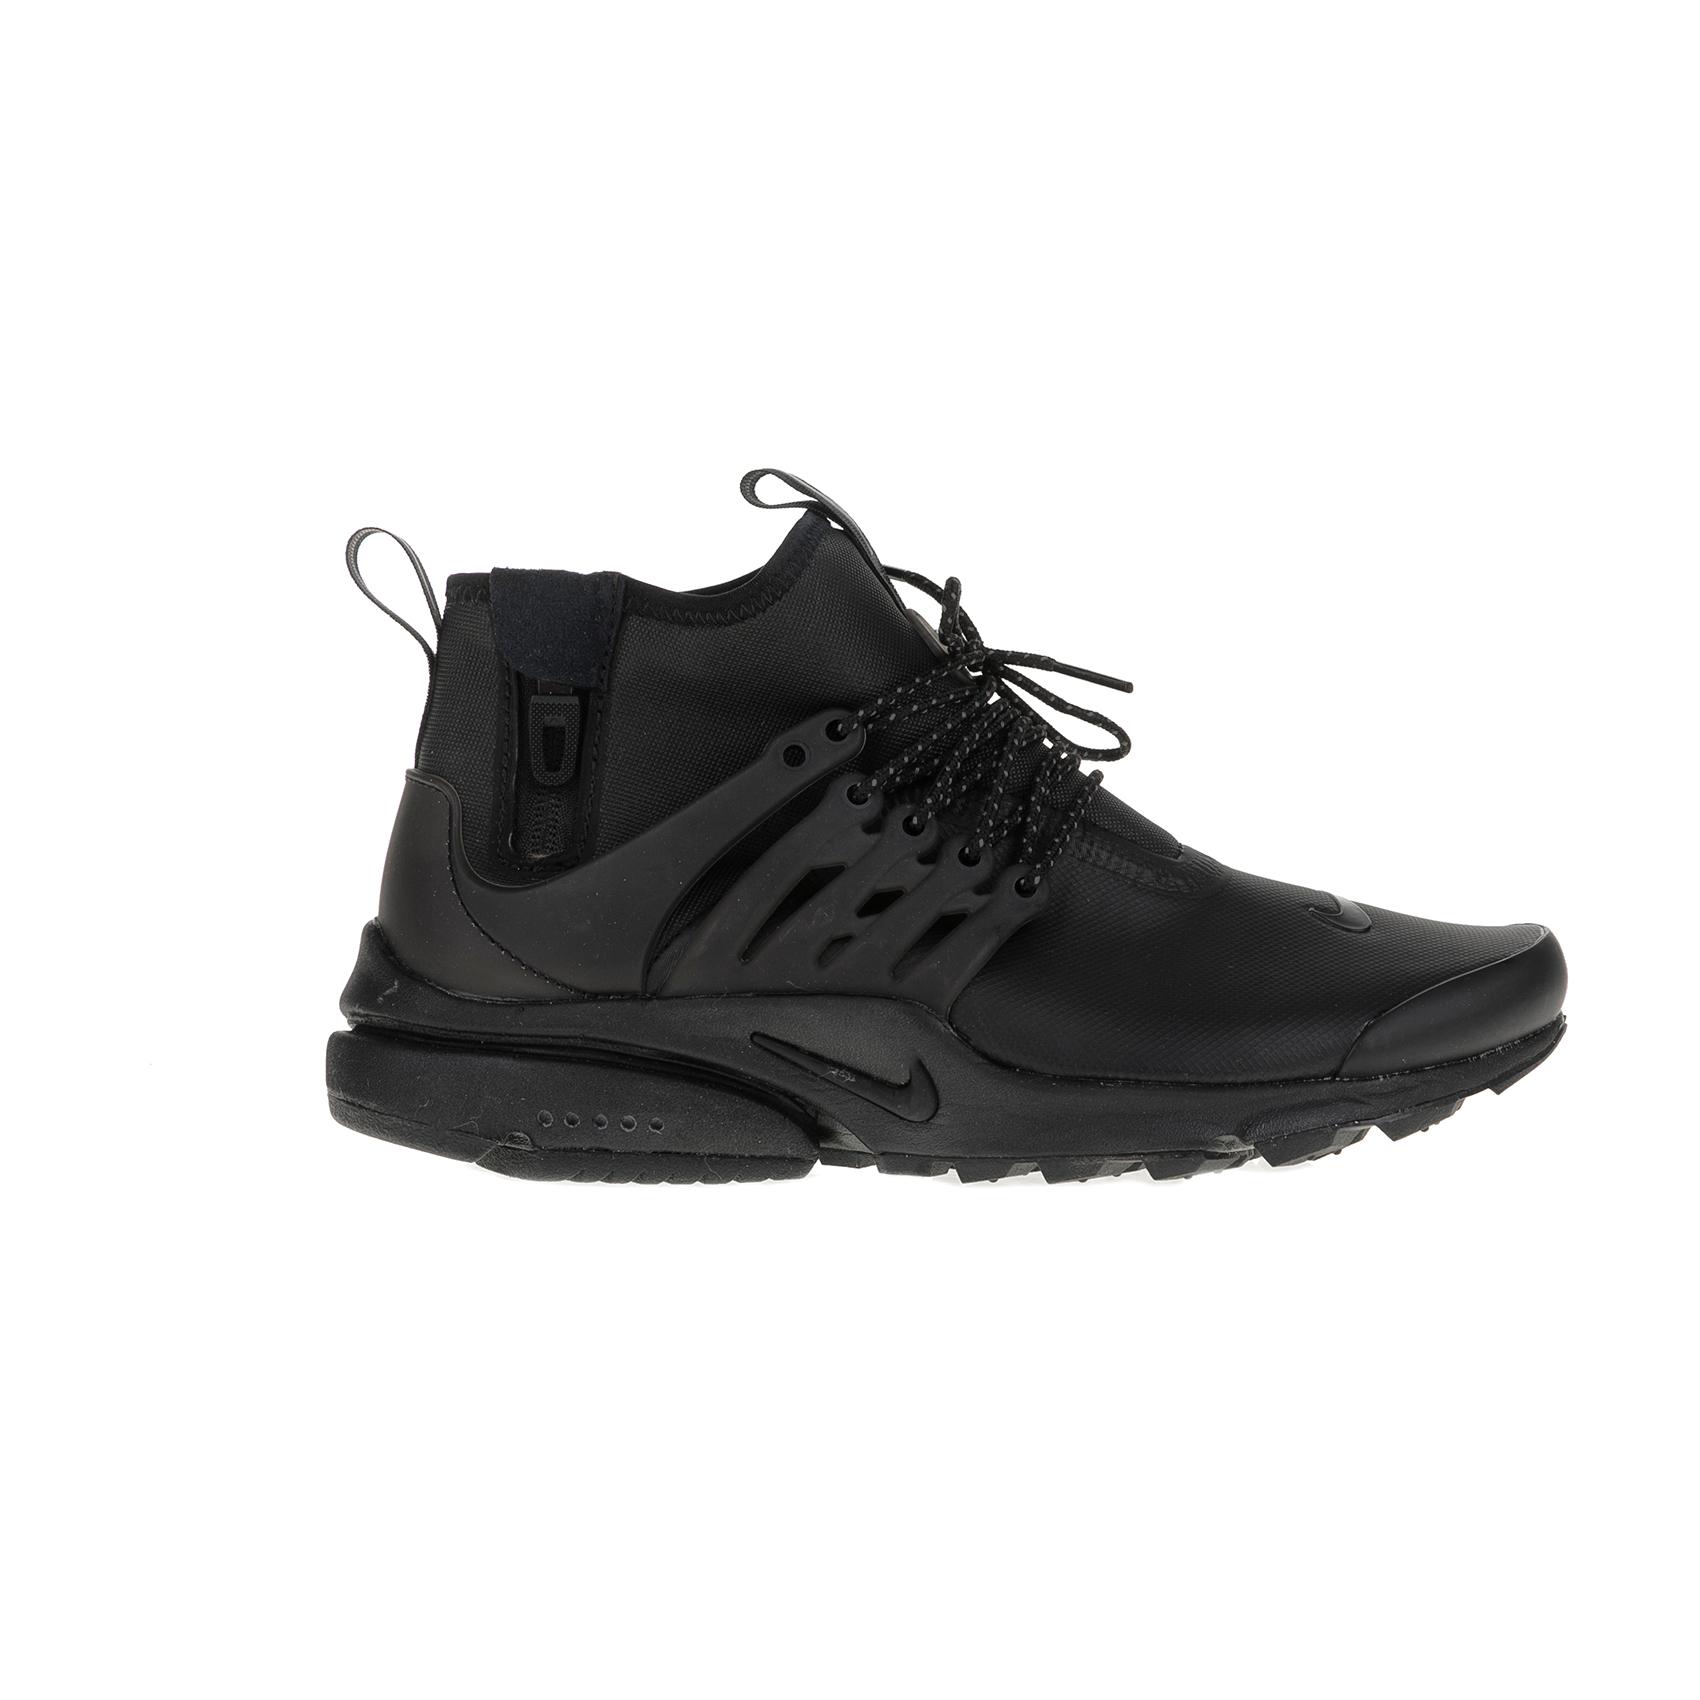 NIKE - Ανδρικά αθλητικά παπούτσια AIR PRESTO MID UTILITY μαύρα